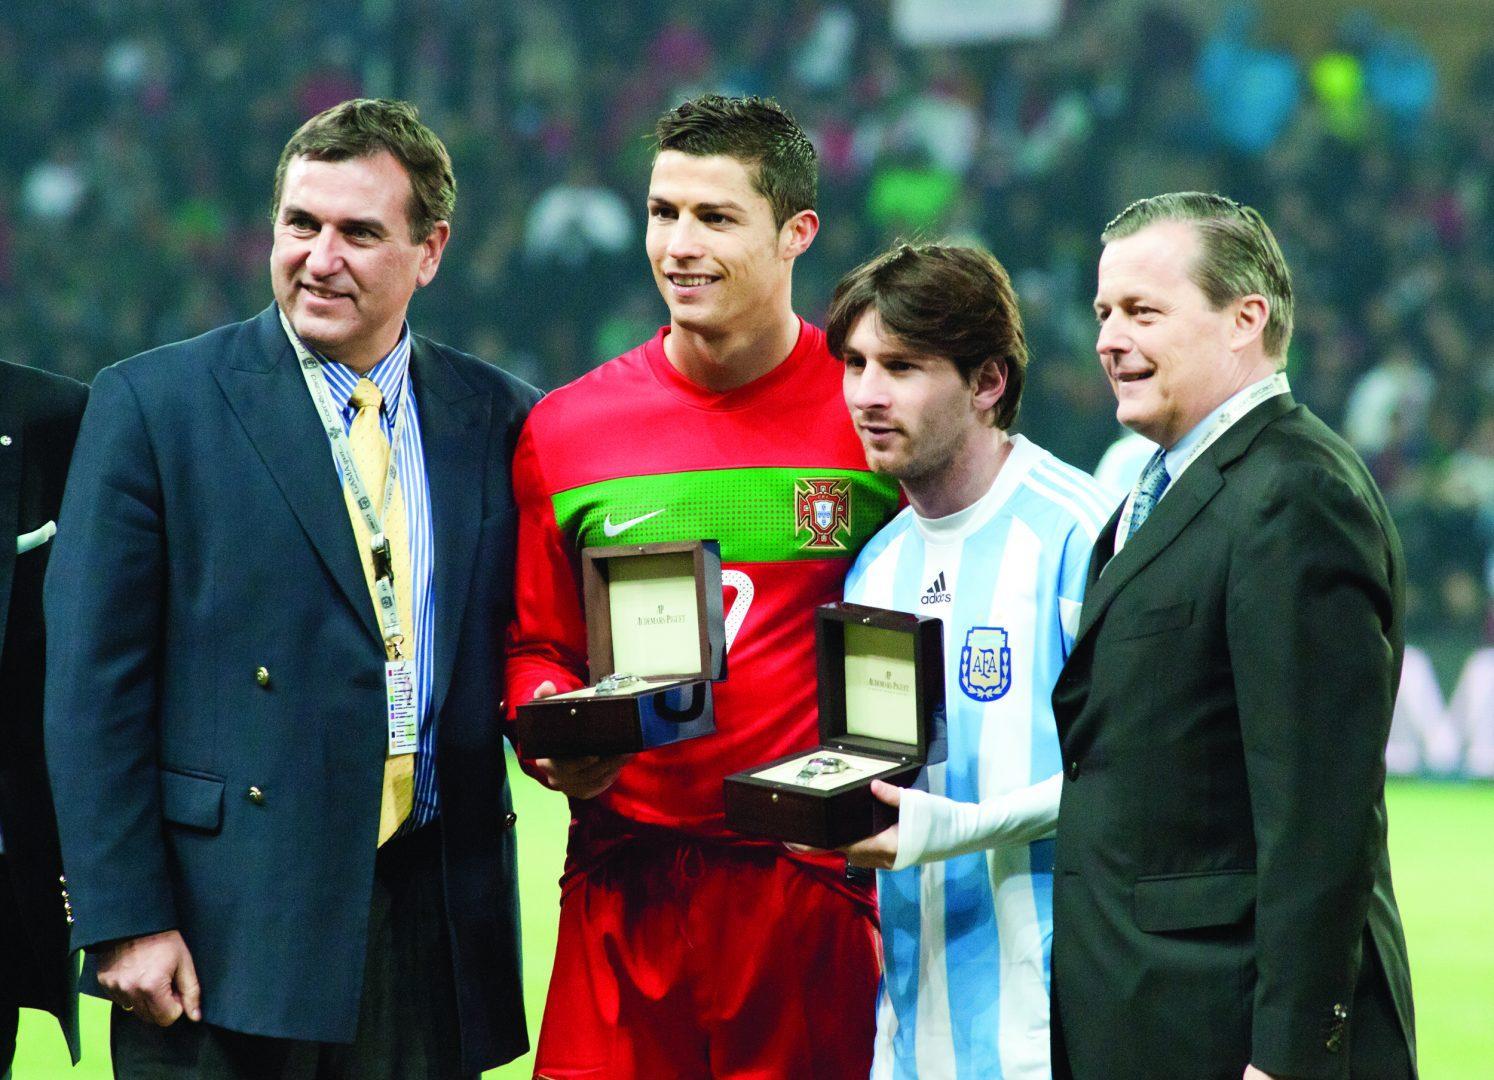 Players Cristiano Ronaldo and Lionel Messi have the biggest rivalry in soccer.  (Fanny Schertzer /Wikipedia Commons)